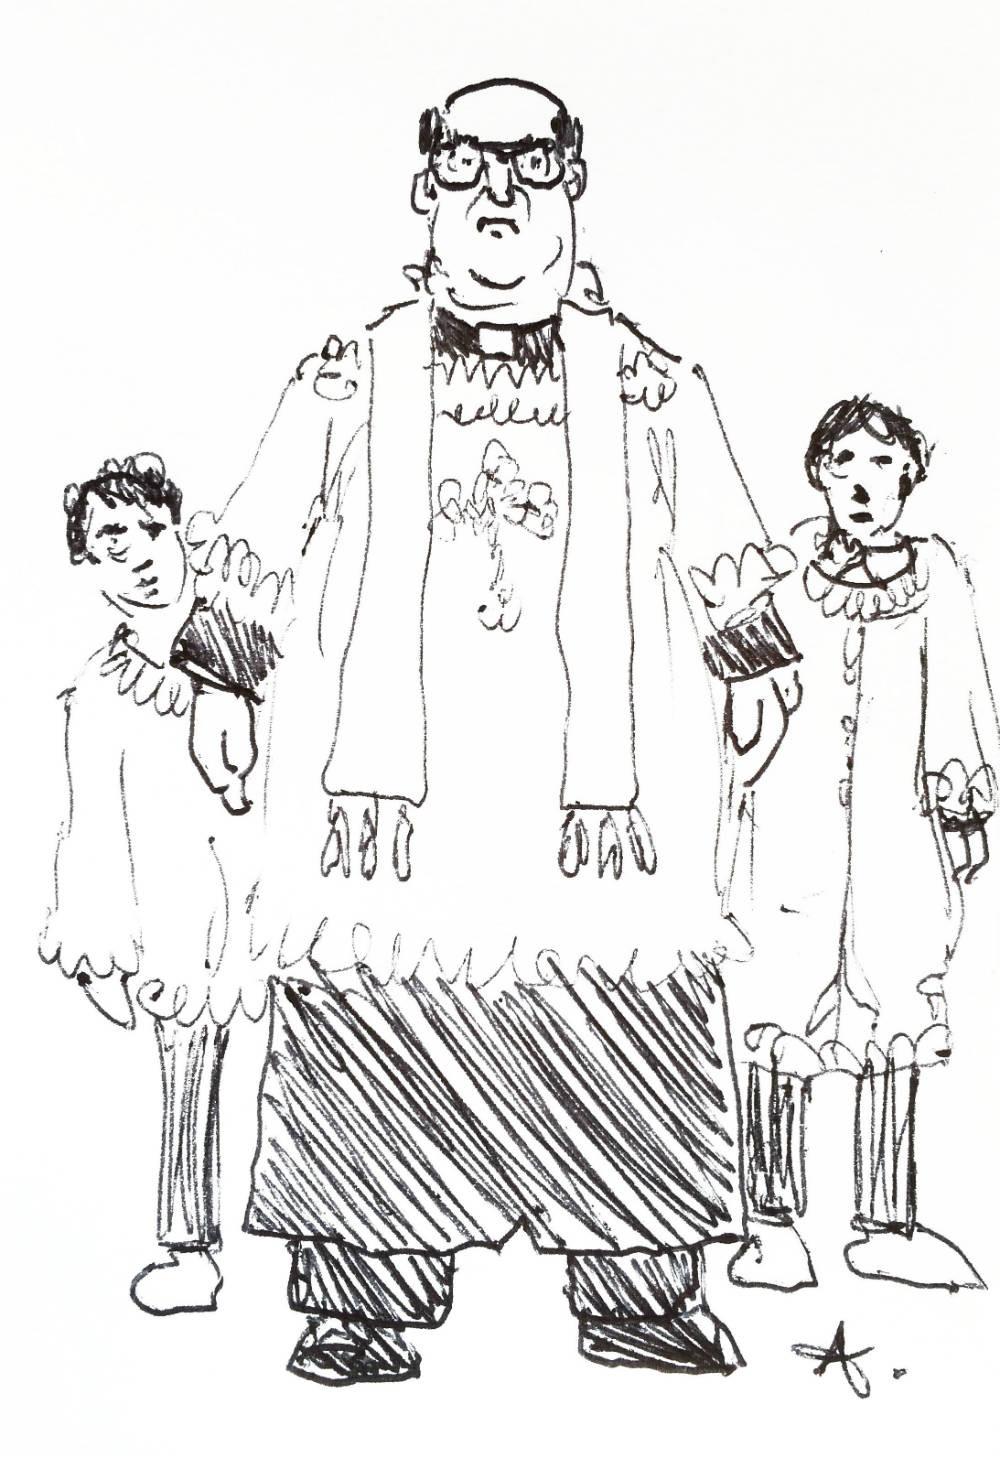 A Sicilian Wedding by Claudio Assandri, the priest